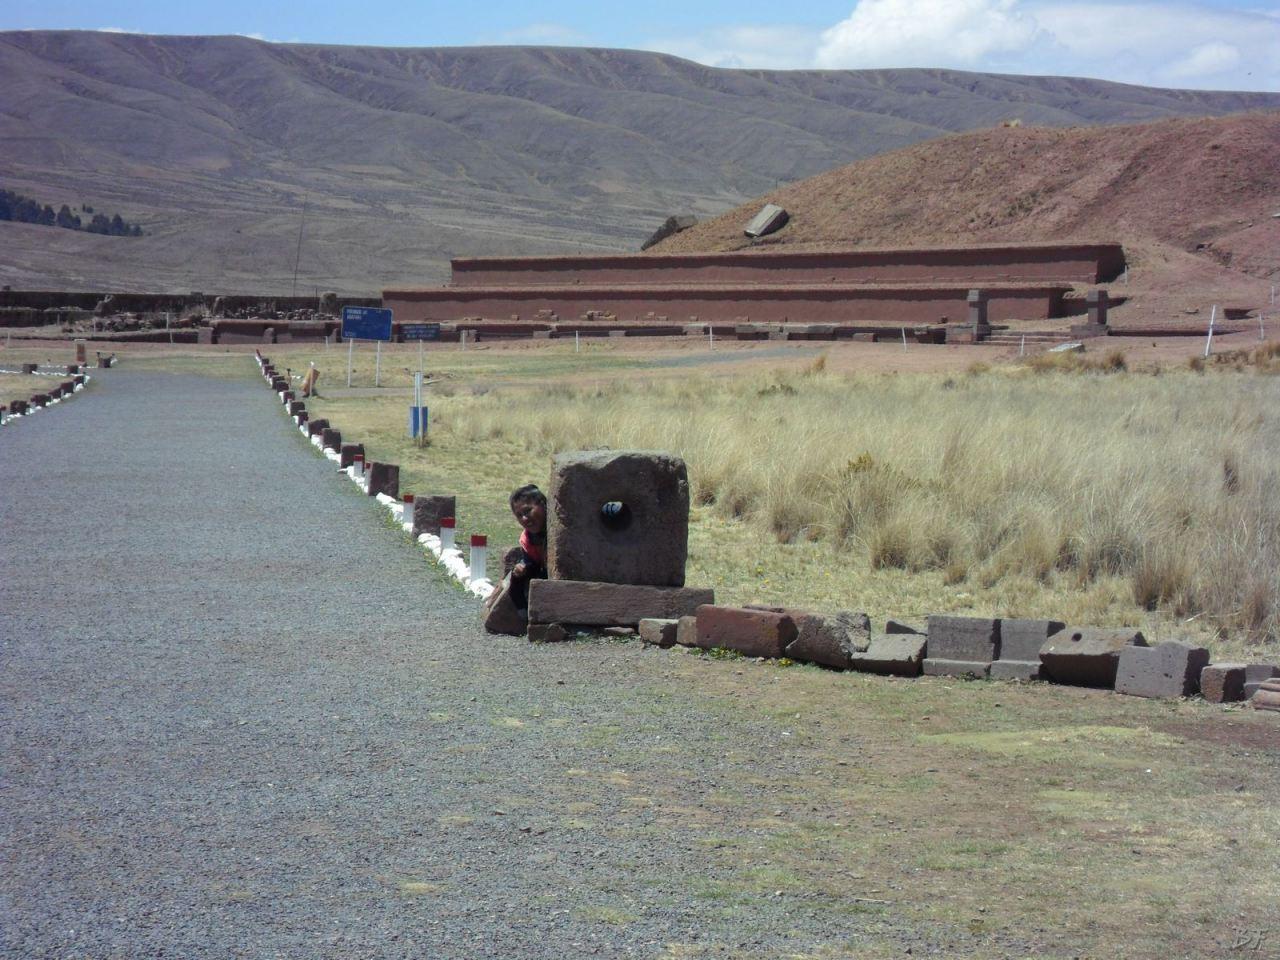 Sito-Megalitico-Piramide-Akapana-Kalasasaya-Menhir-Tiahuanaco-Bolivia-4